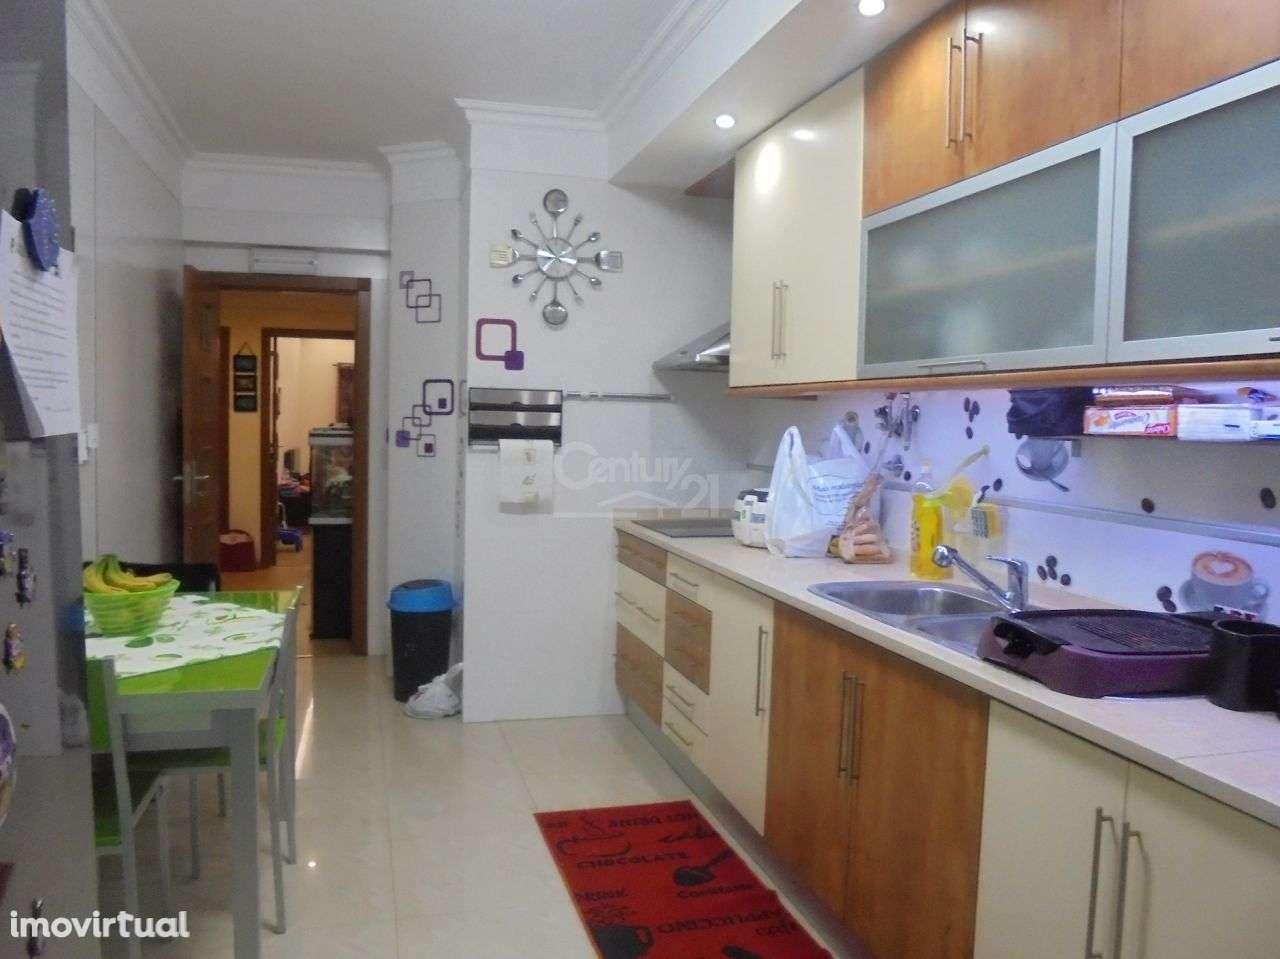 Apartamento para comprar, Arranhó, Lisboa - Foto 1